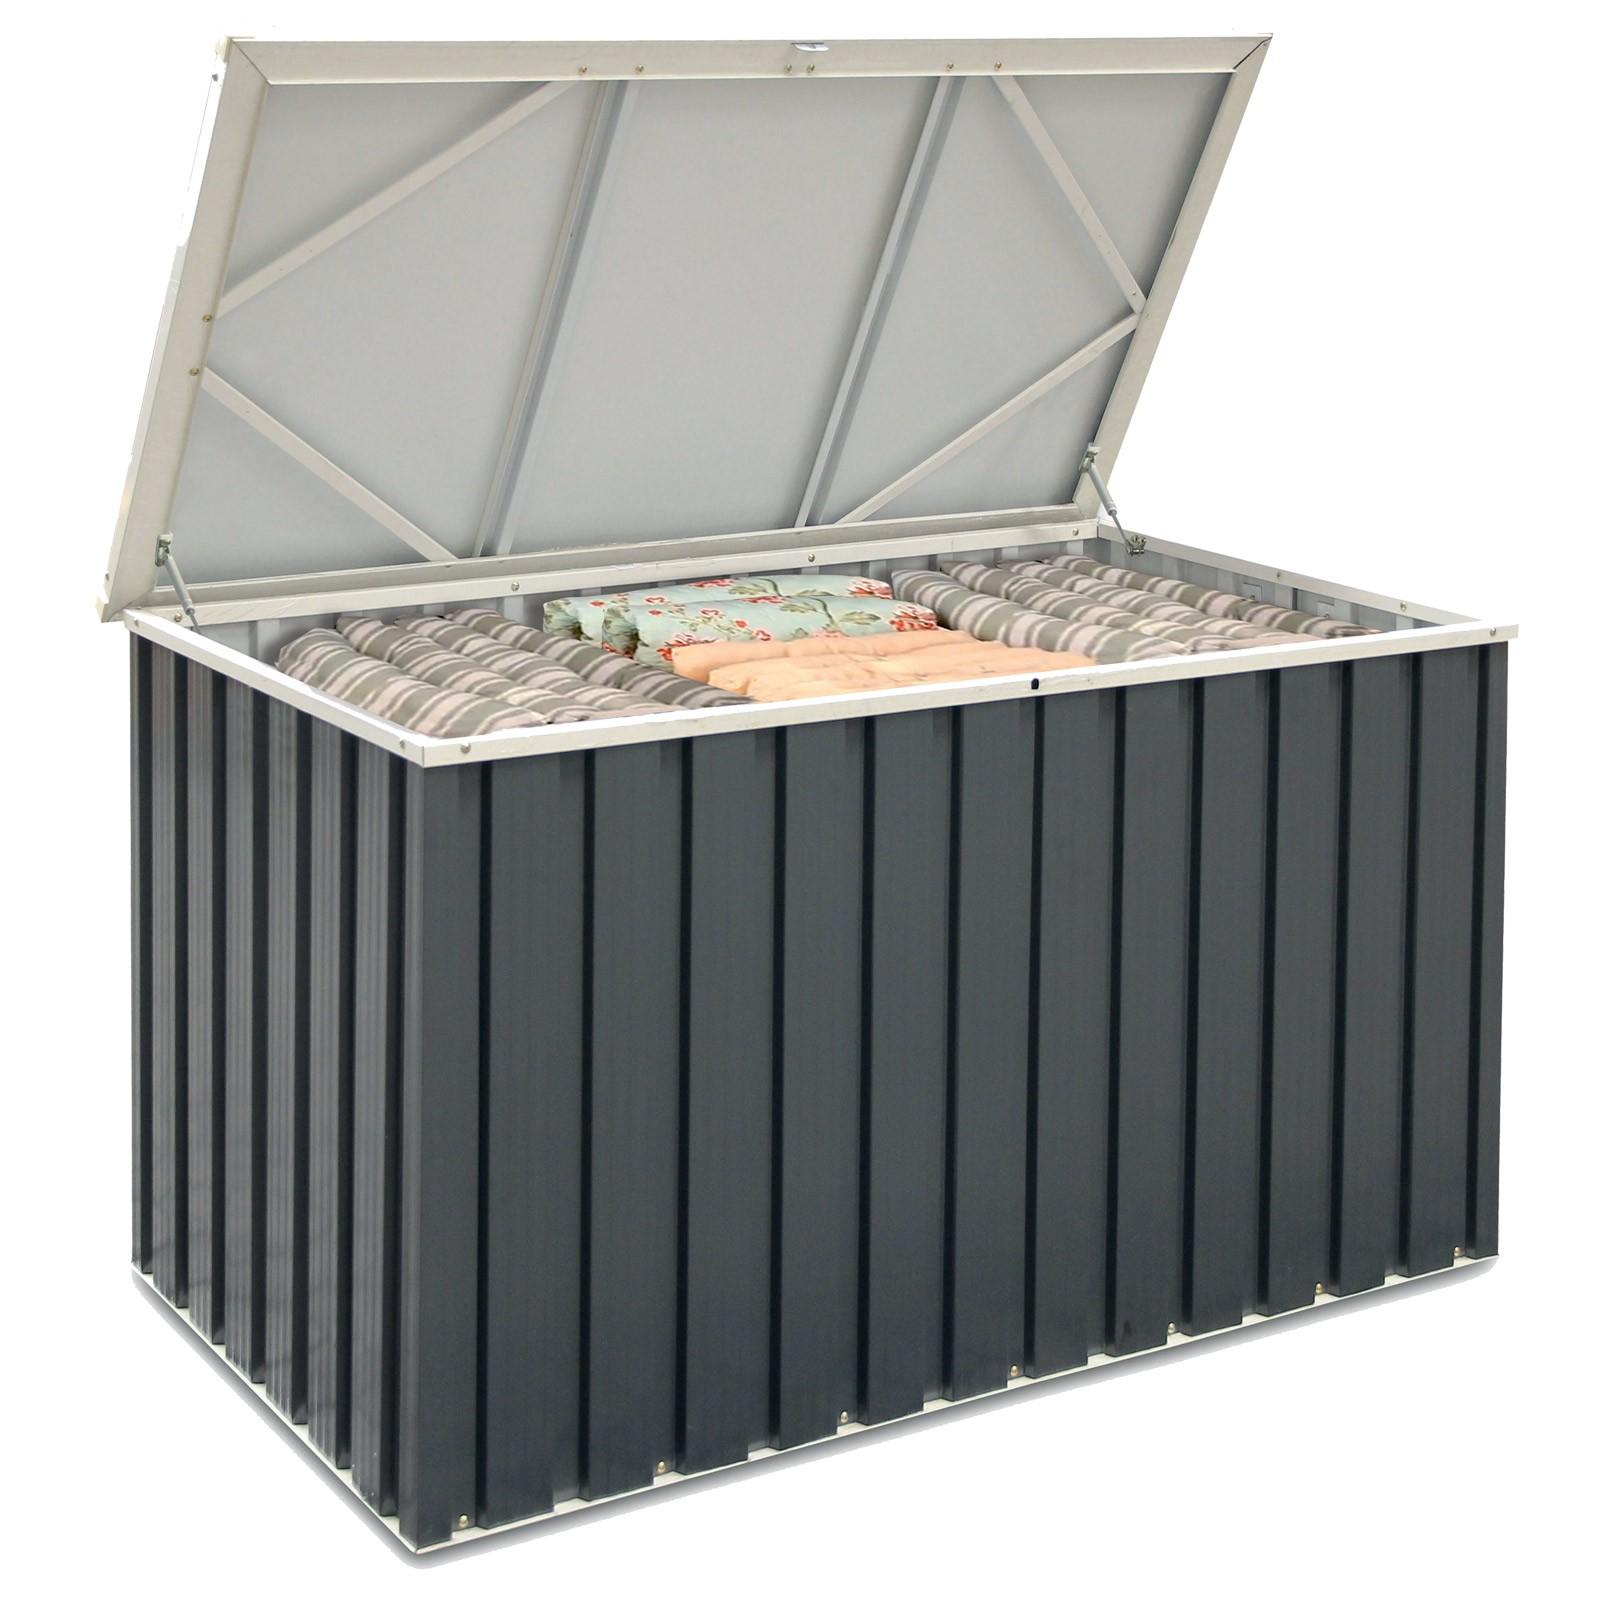 keter metall ger tebox auflagenbox 135 x 70. Black Bedroom Furniture Sets. Home Design Ideas